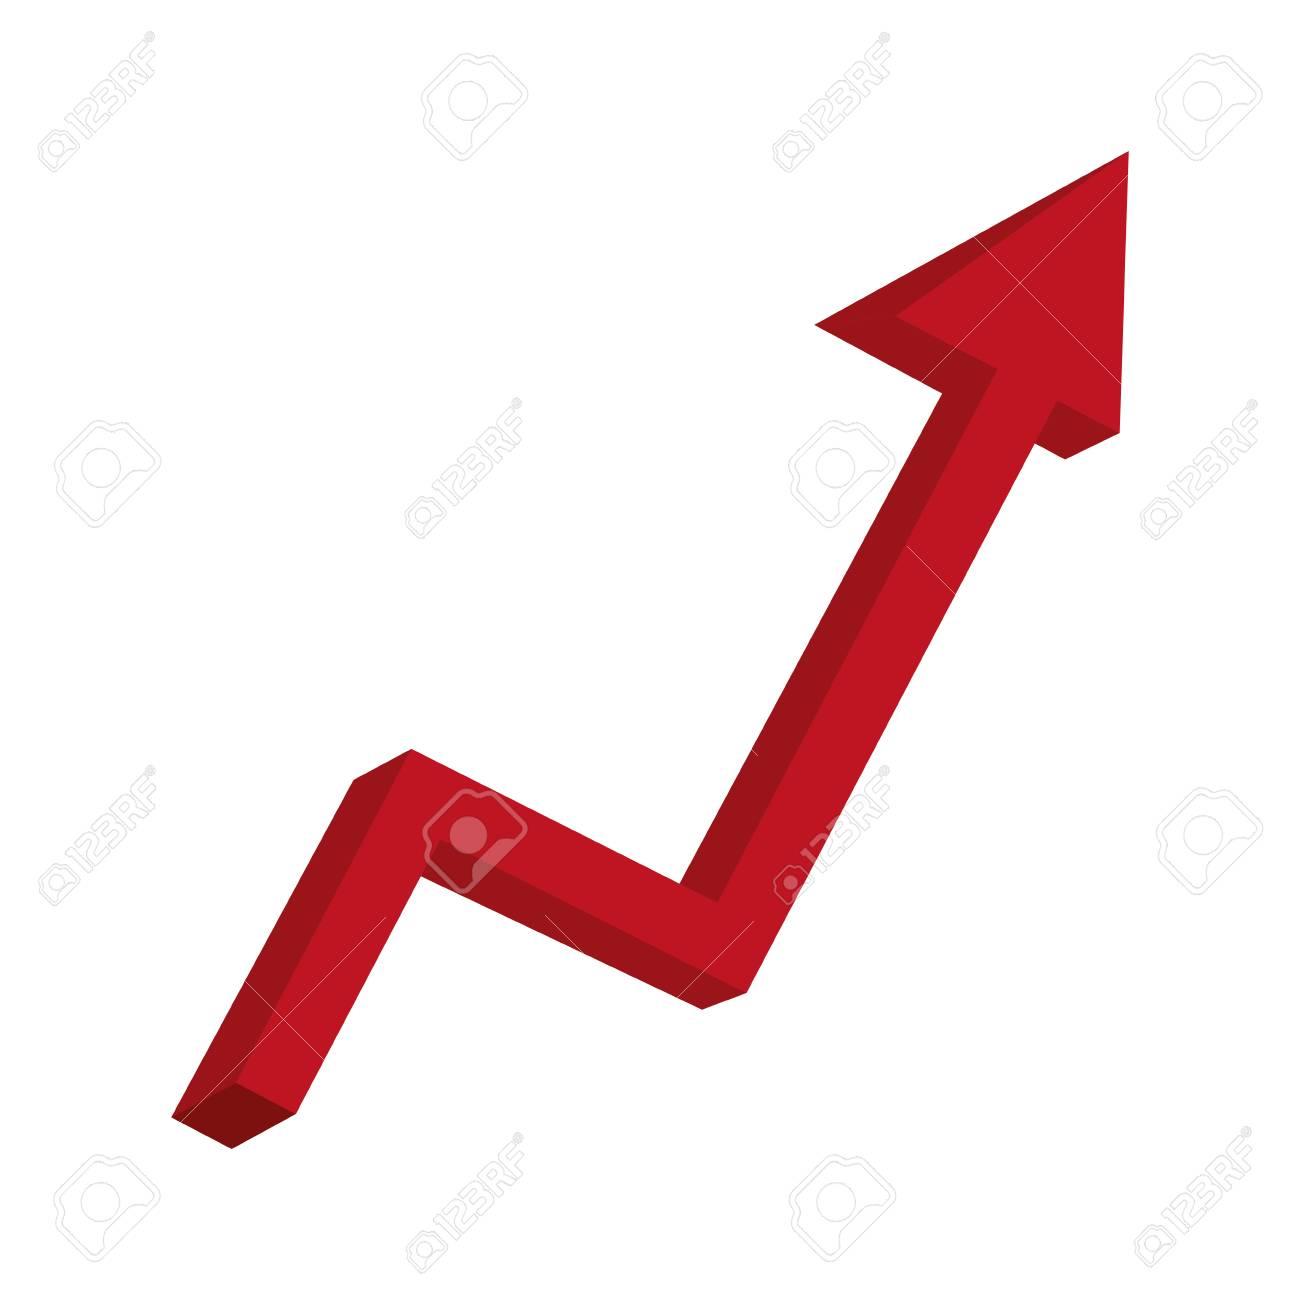 arrow statistics up icon vector illustration design - 117336461